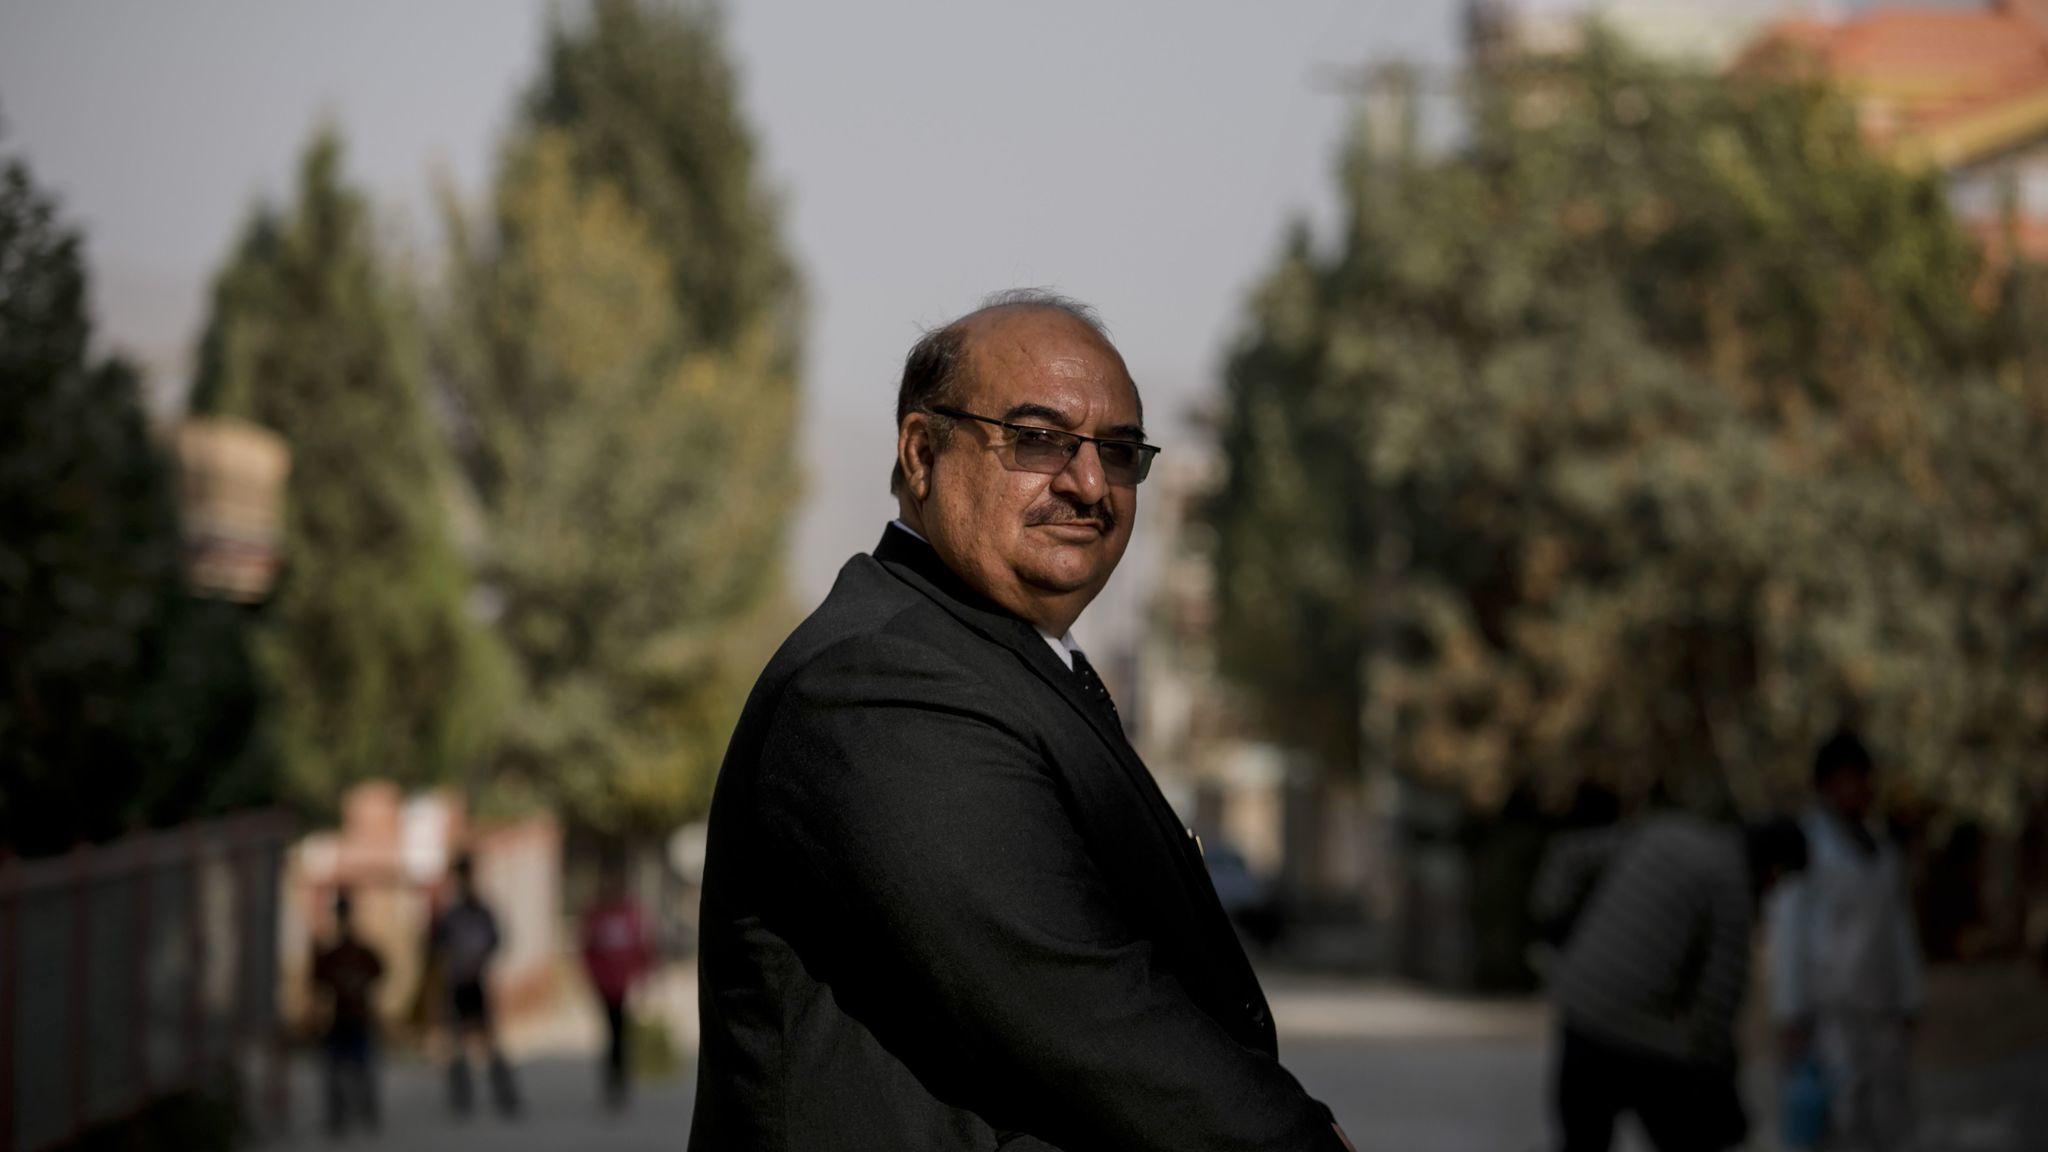 KABUL, KABUL PROVINCE — SUNDAY, OCTOBER 22, 2017: Col. Mohammad Nabi Majrooh, the deputy head of t